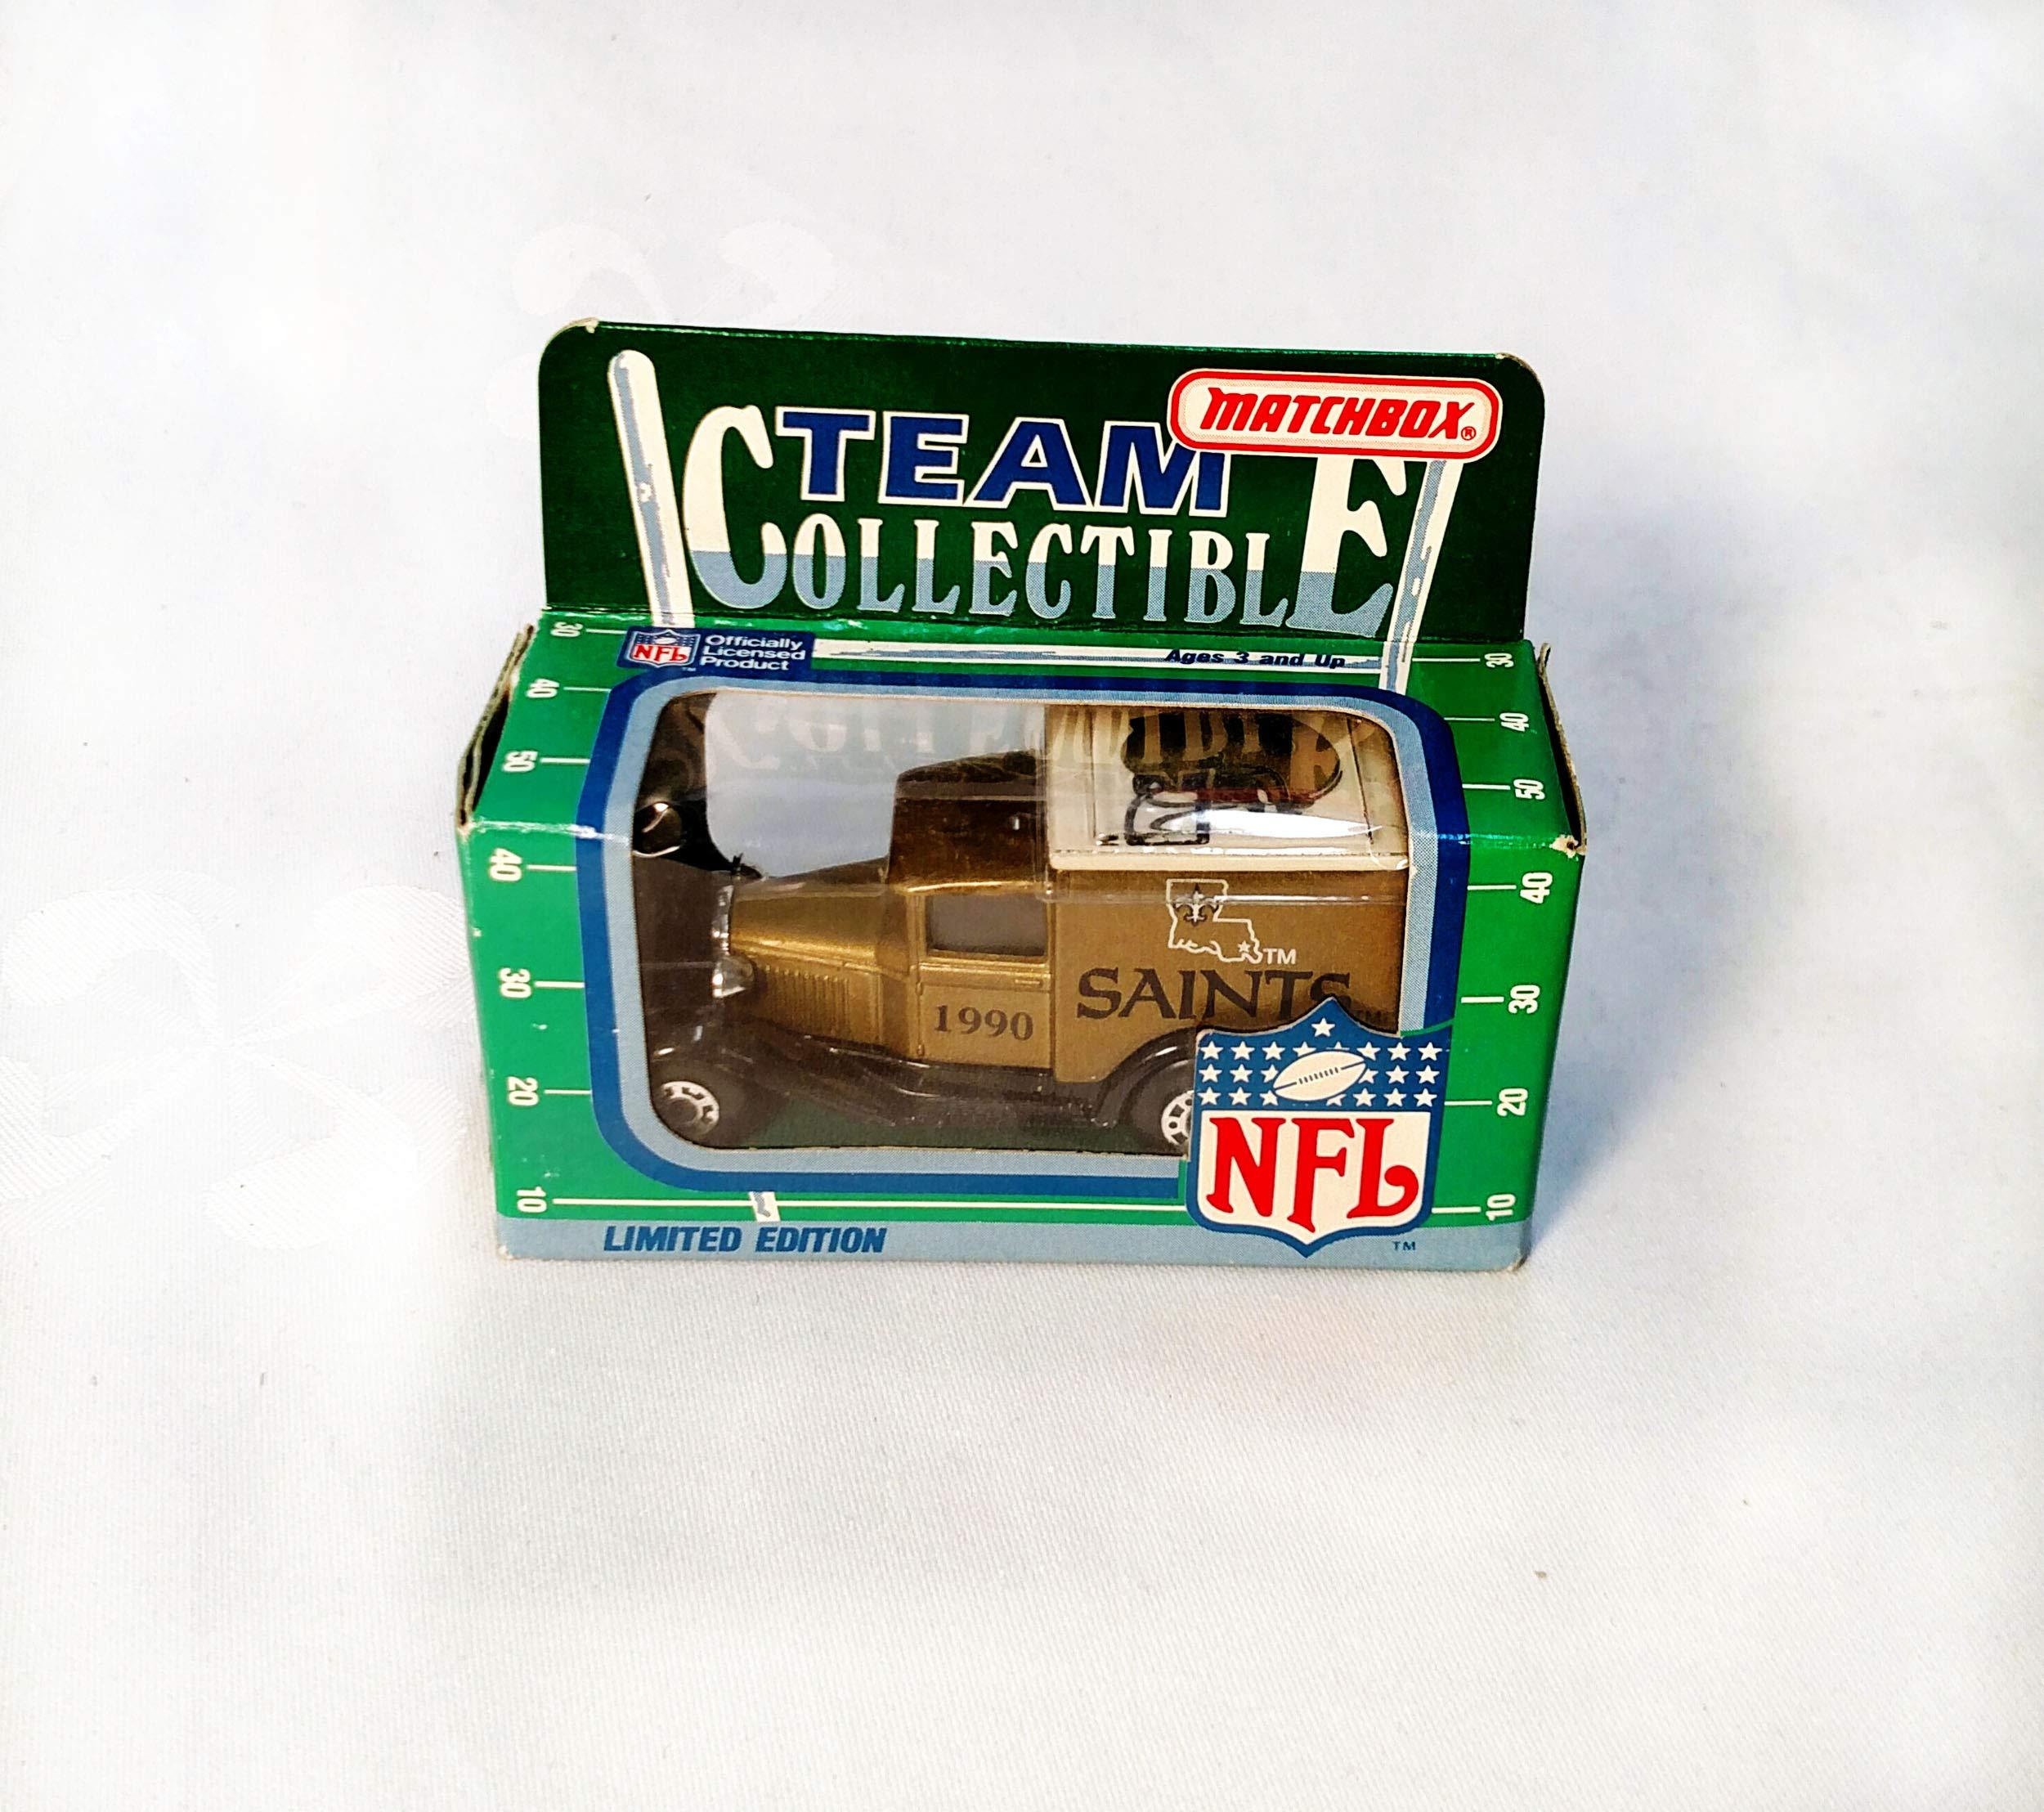 New Orleans Saints 1990 Limited Edition Matchbox Die Cast Collectible